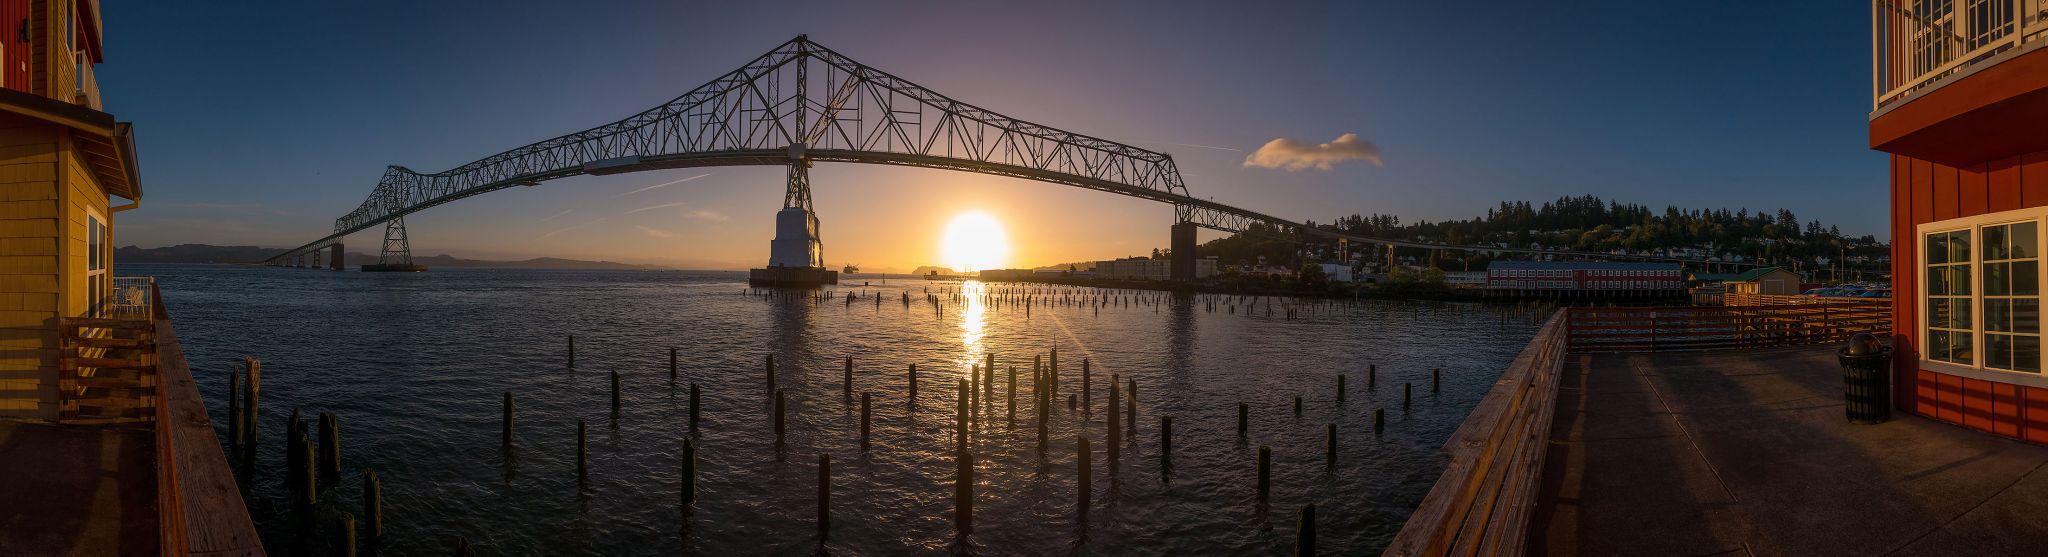 Astoria Bridge over Columbia River, Oregon USA, USA